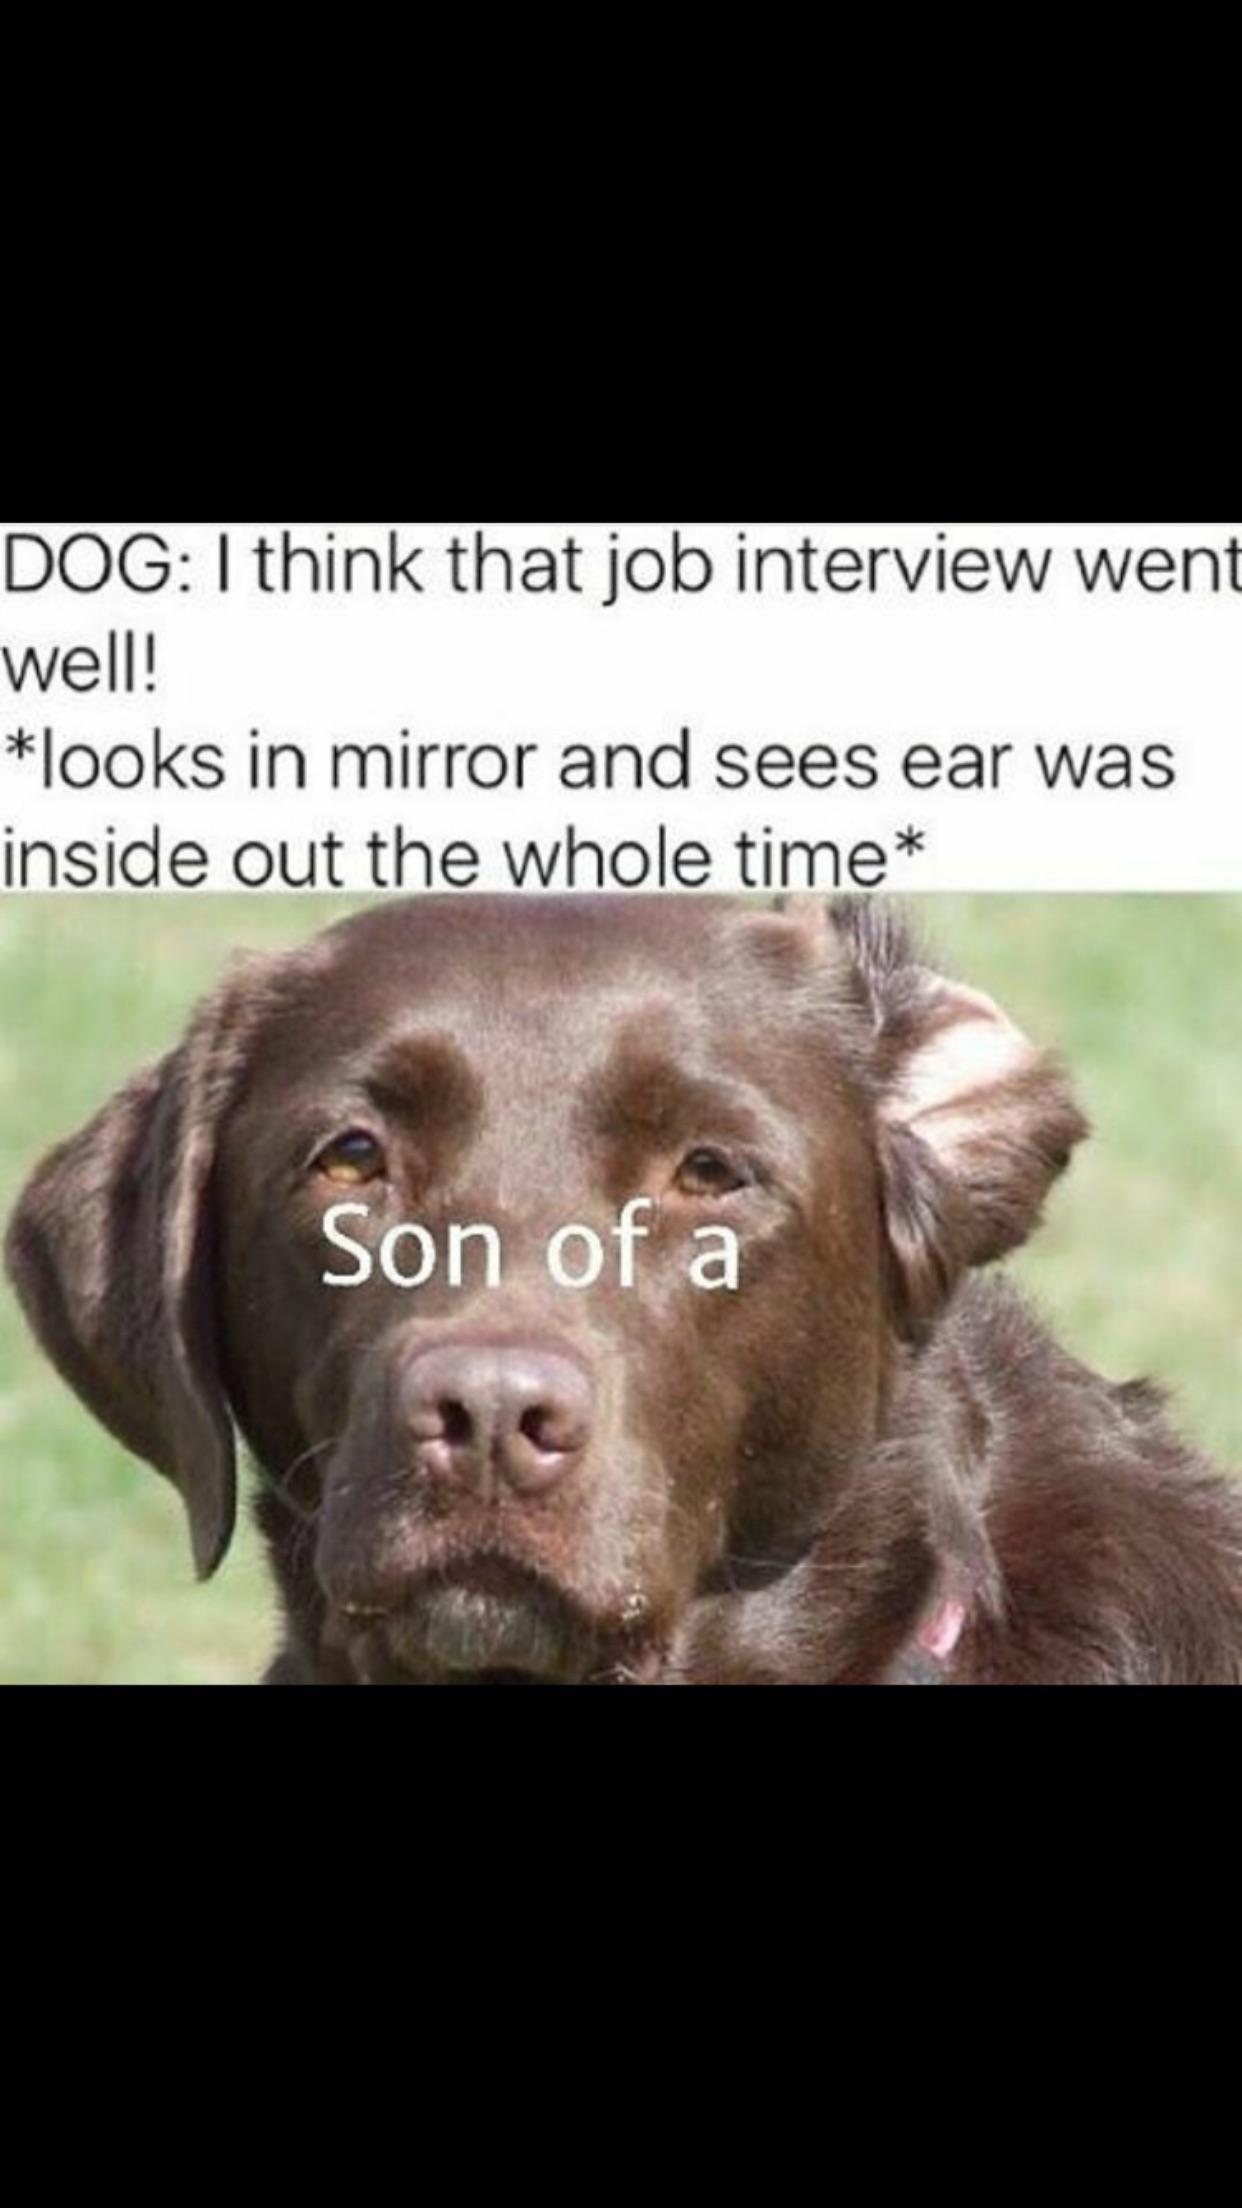 Poor doggo probably didn't get the job